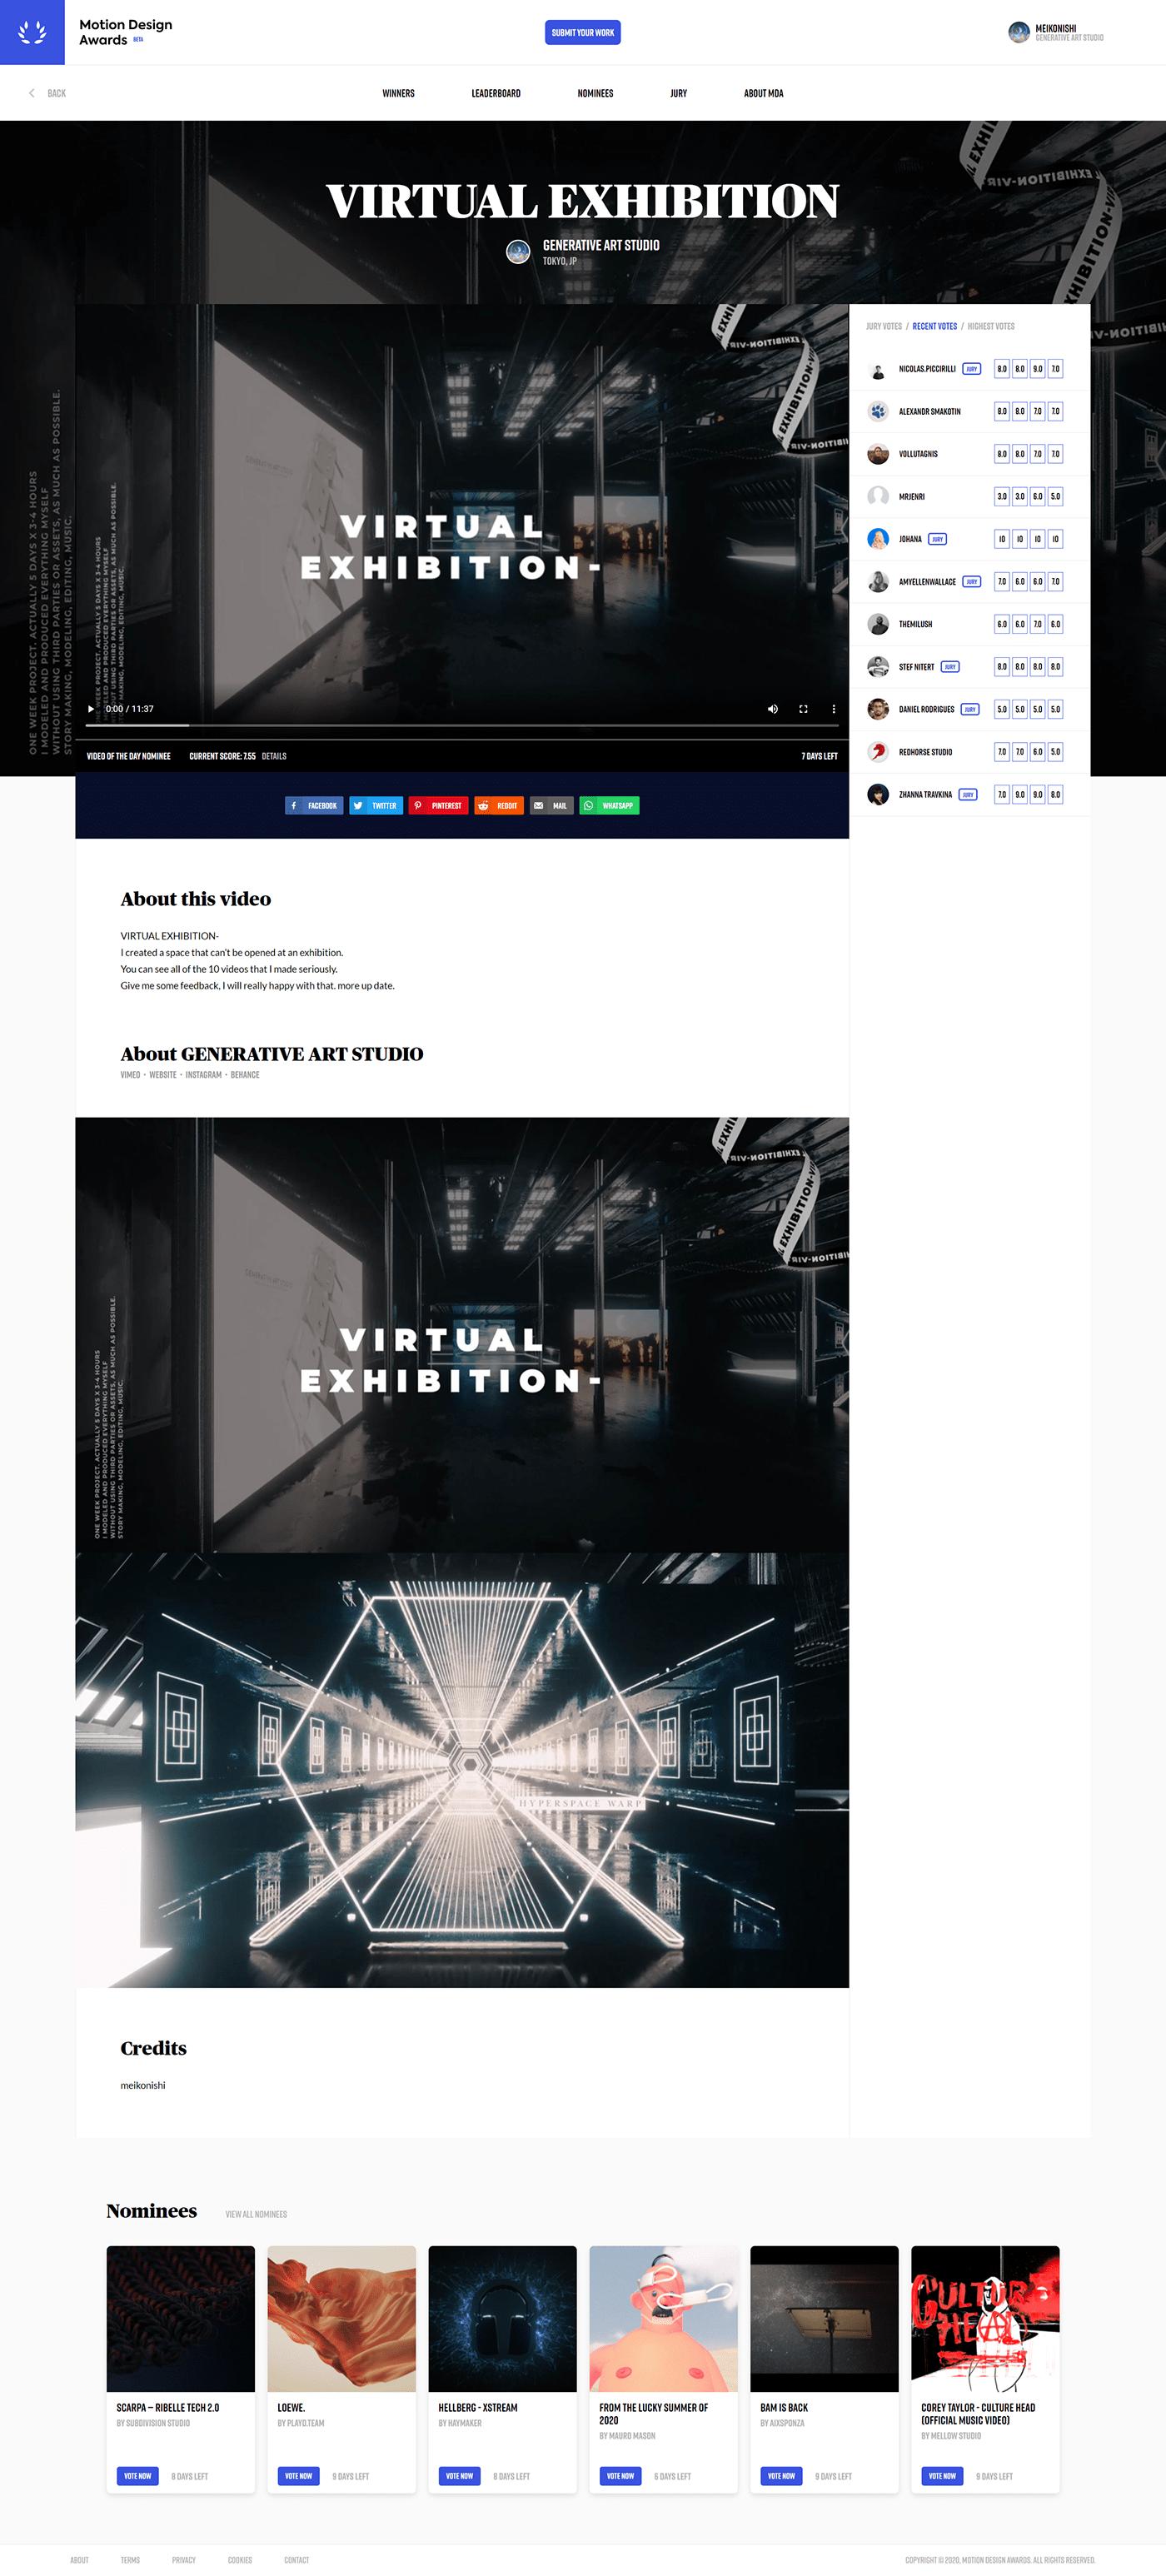 art CG Exhibition  graphic motiongraphics virtual virtual exhibition